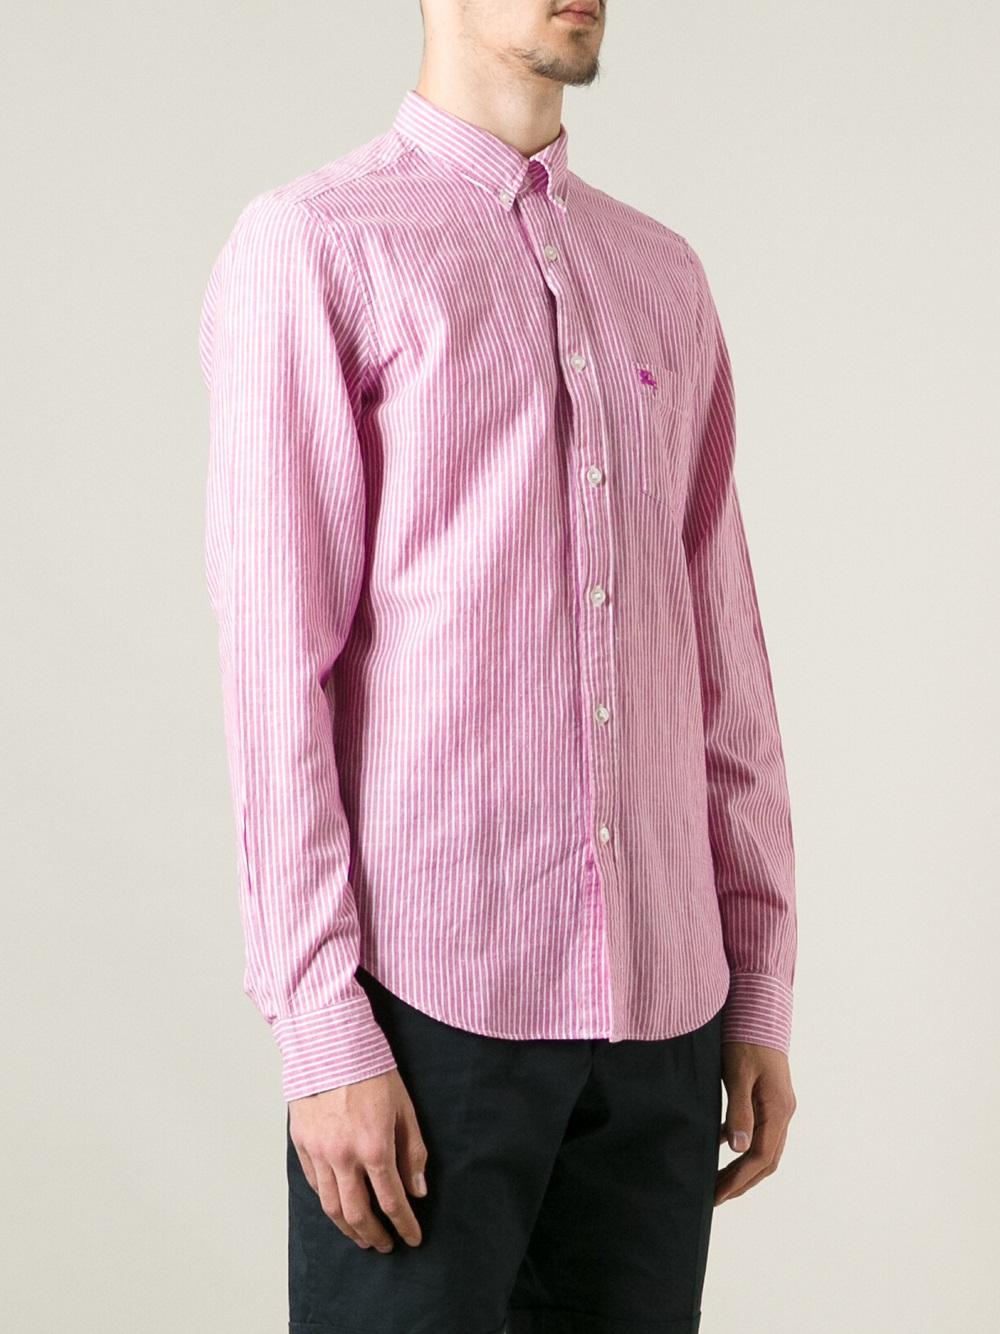 da4de4e7 Burberry Brit Striped Button Down Shirt in Pink for Men - Lyst